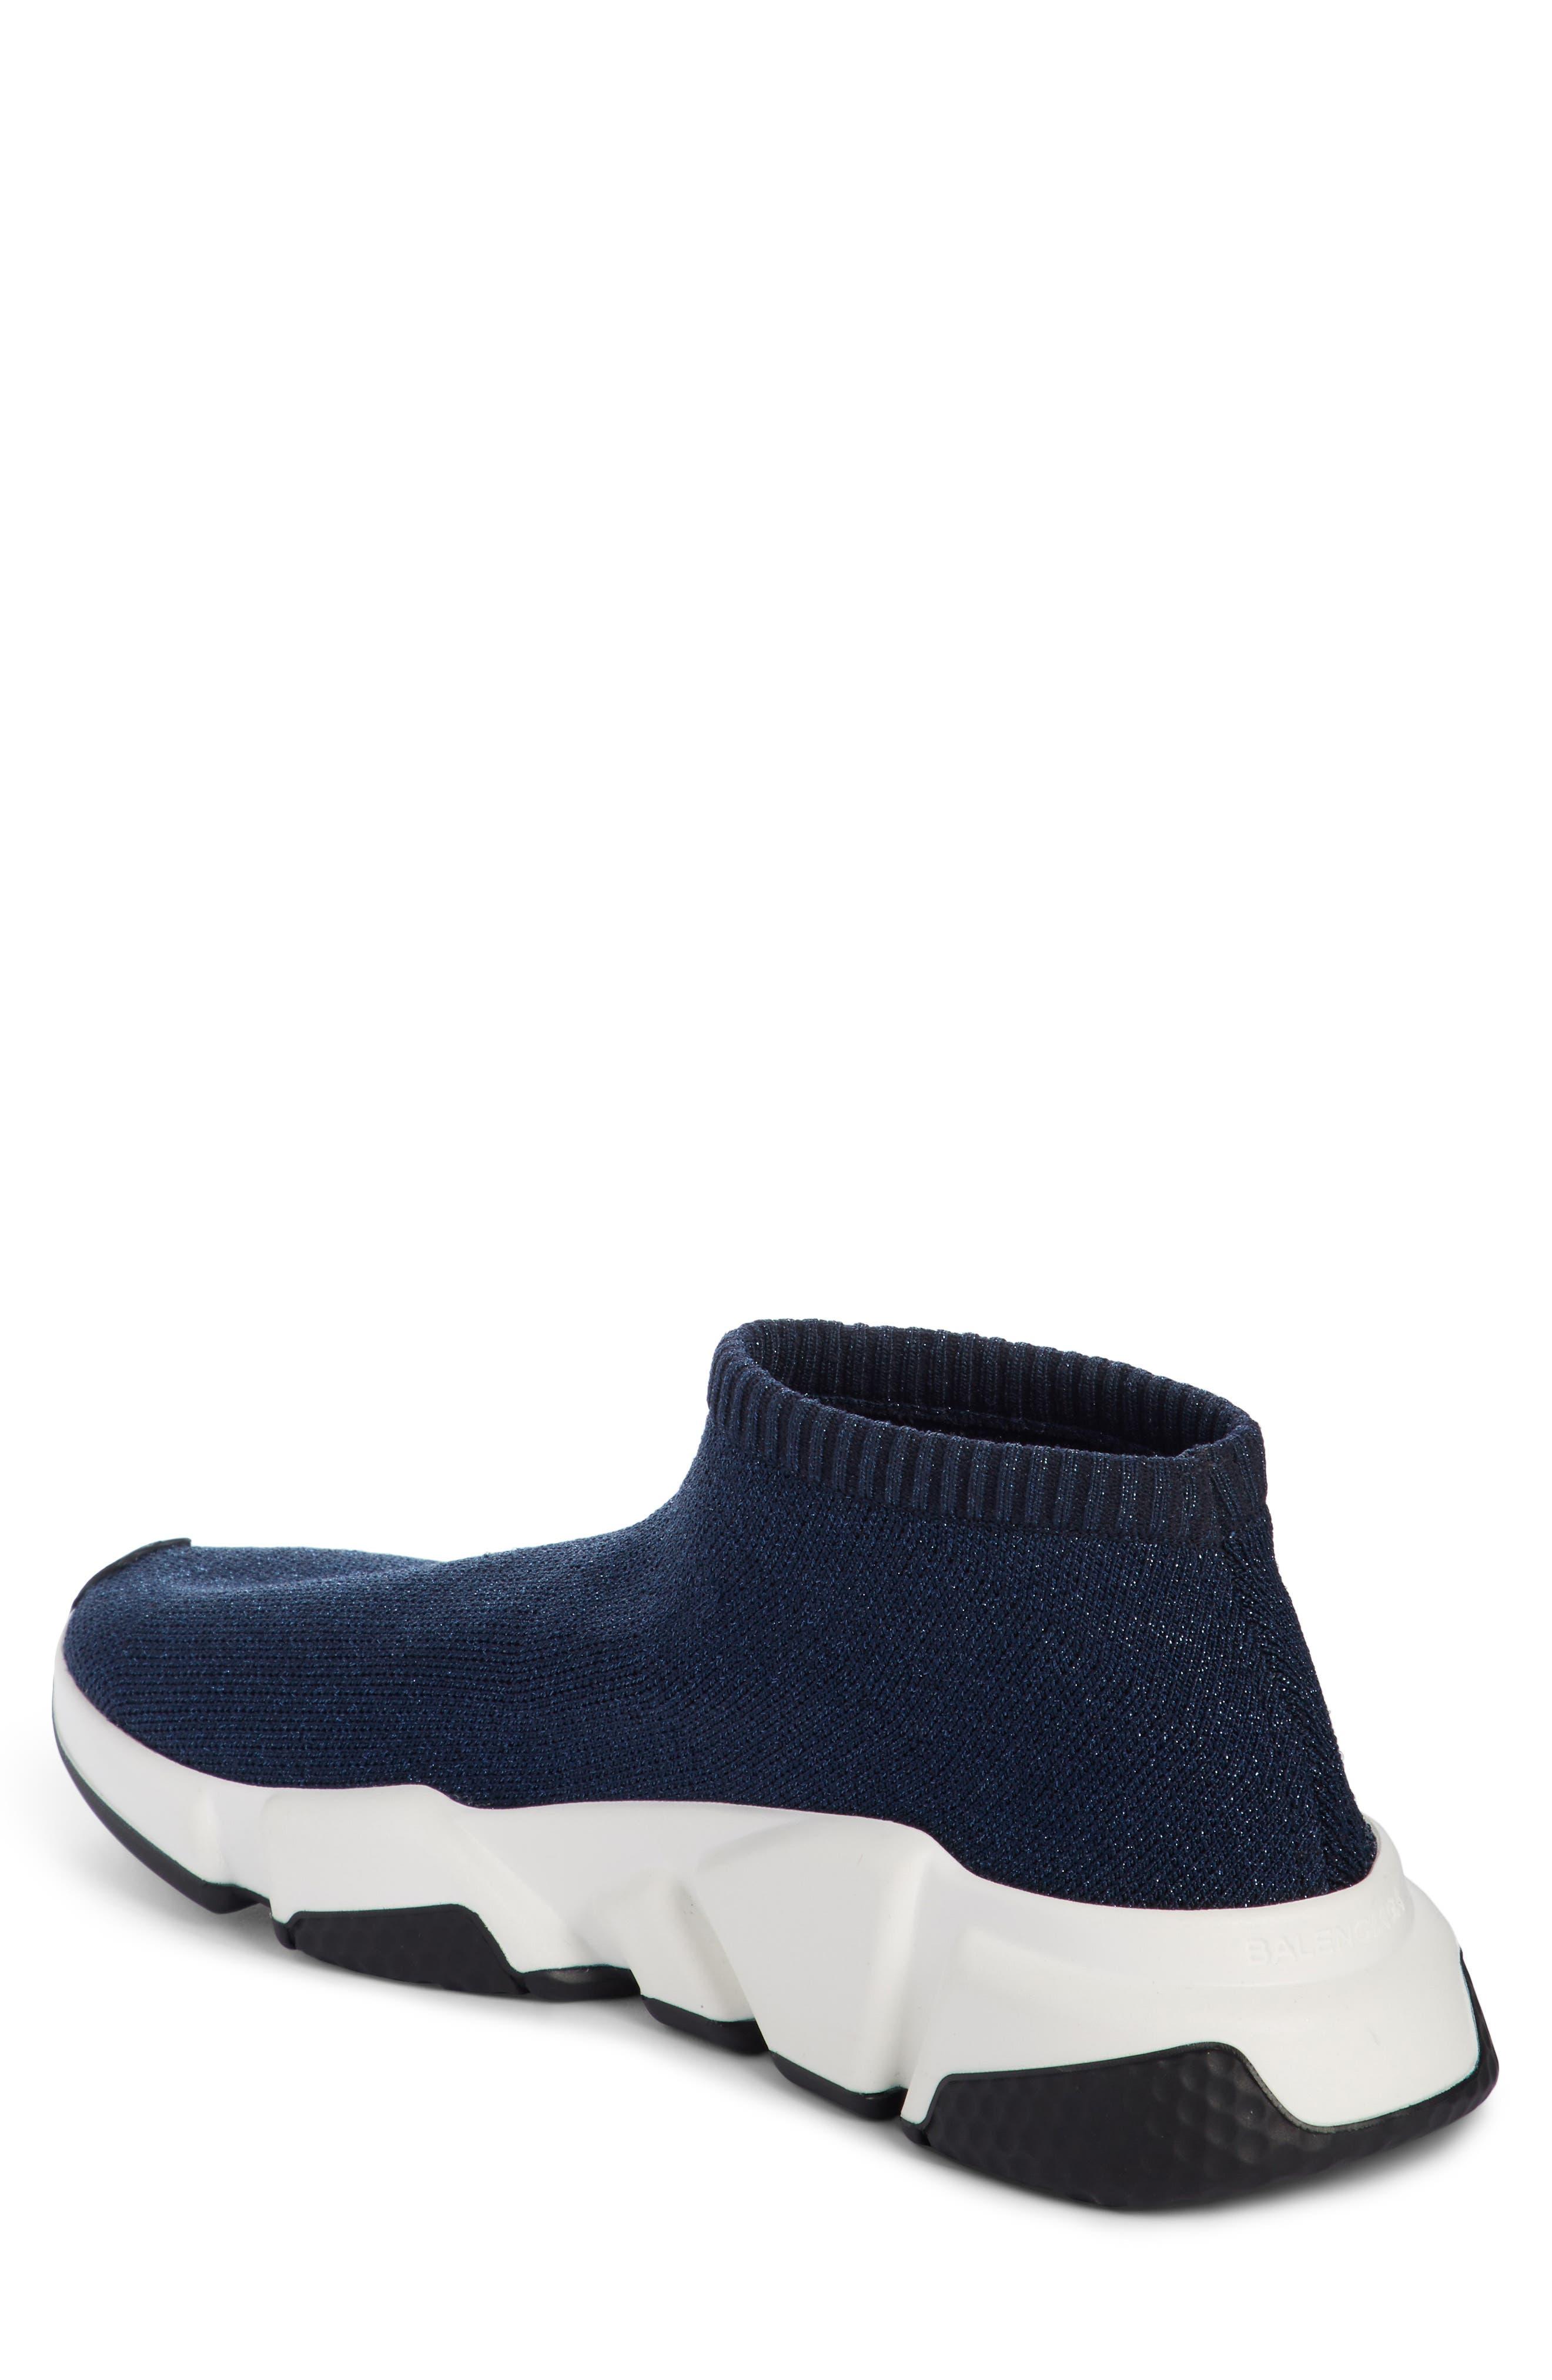 Alternate Image 2  - Balenciaga Low Speed Sneaker (Women)